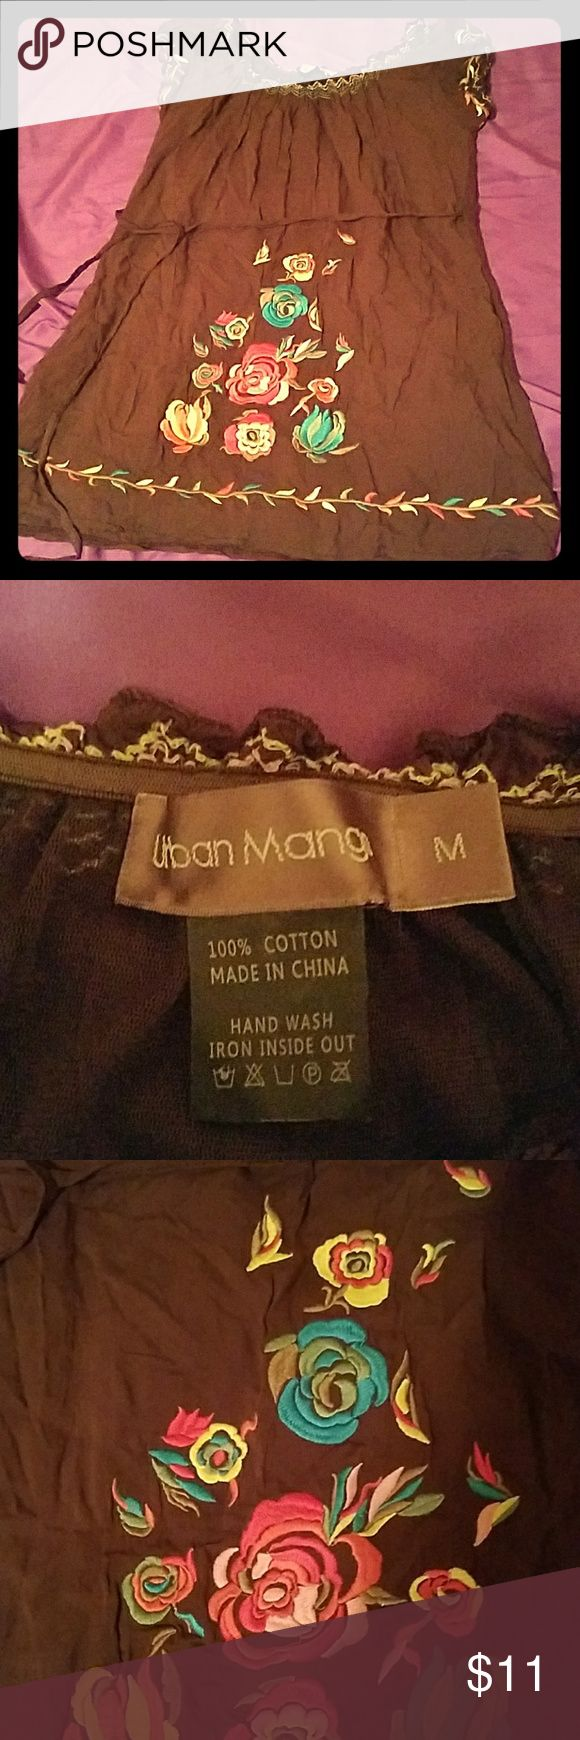 Urban Mango boho mini dress, size M 100% cotton, brown mini dress with pink, blue, yellow & green embroidered flowers, ties at waist, cap sleeves, scoop neck, gently worn Urban Mango  Dresses Mini